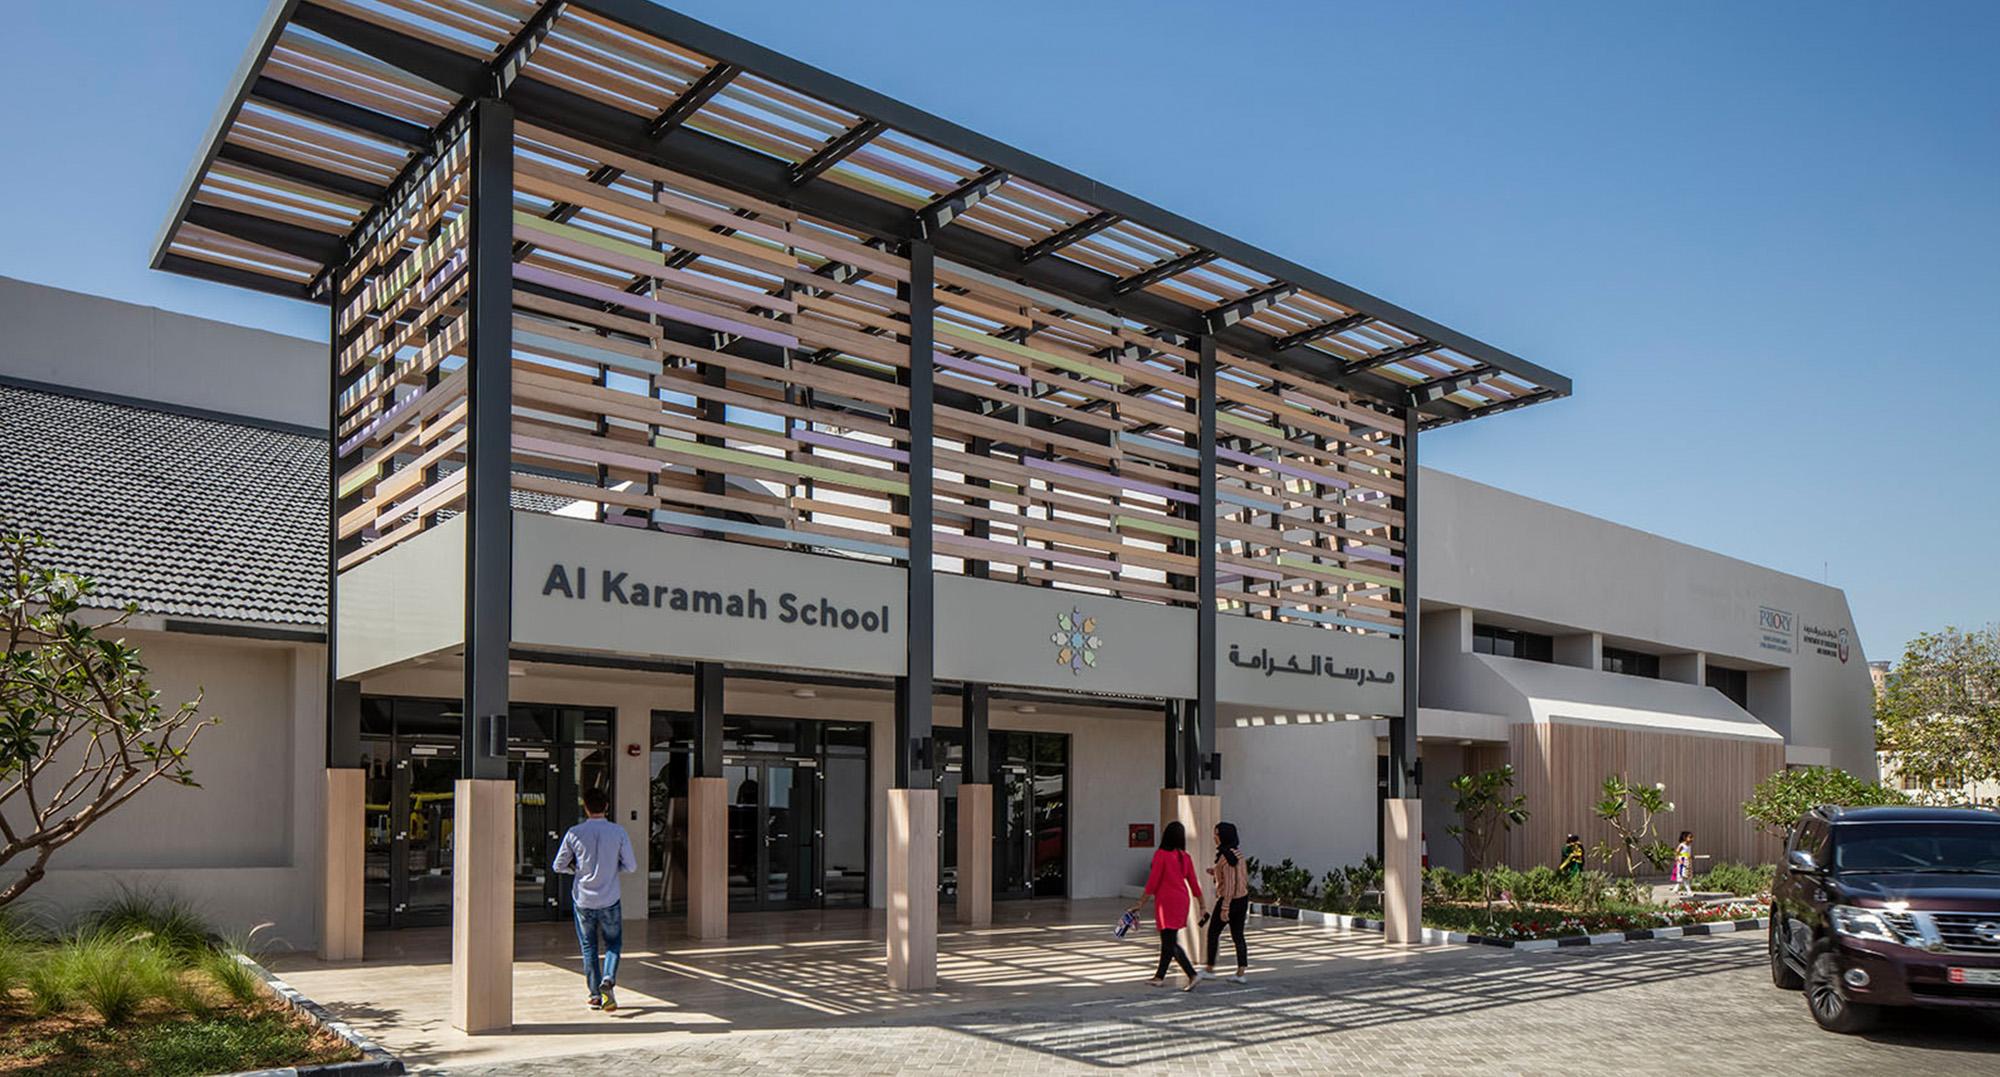 al-karamah-school-branding.jpg